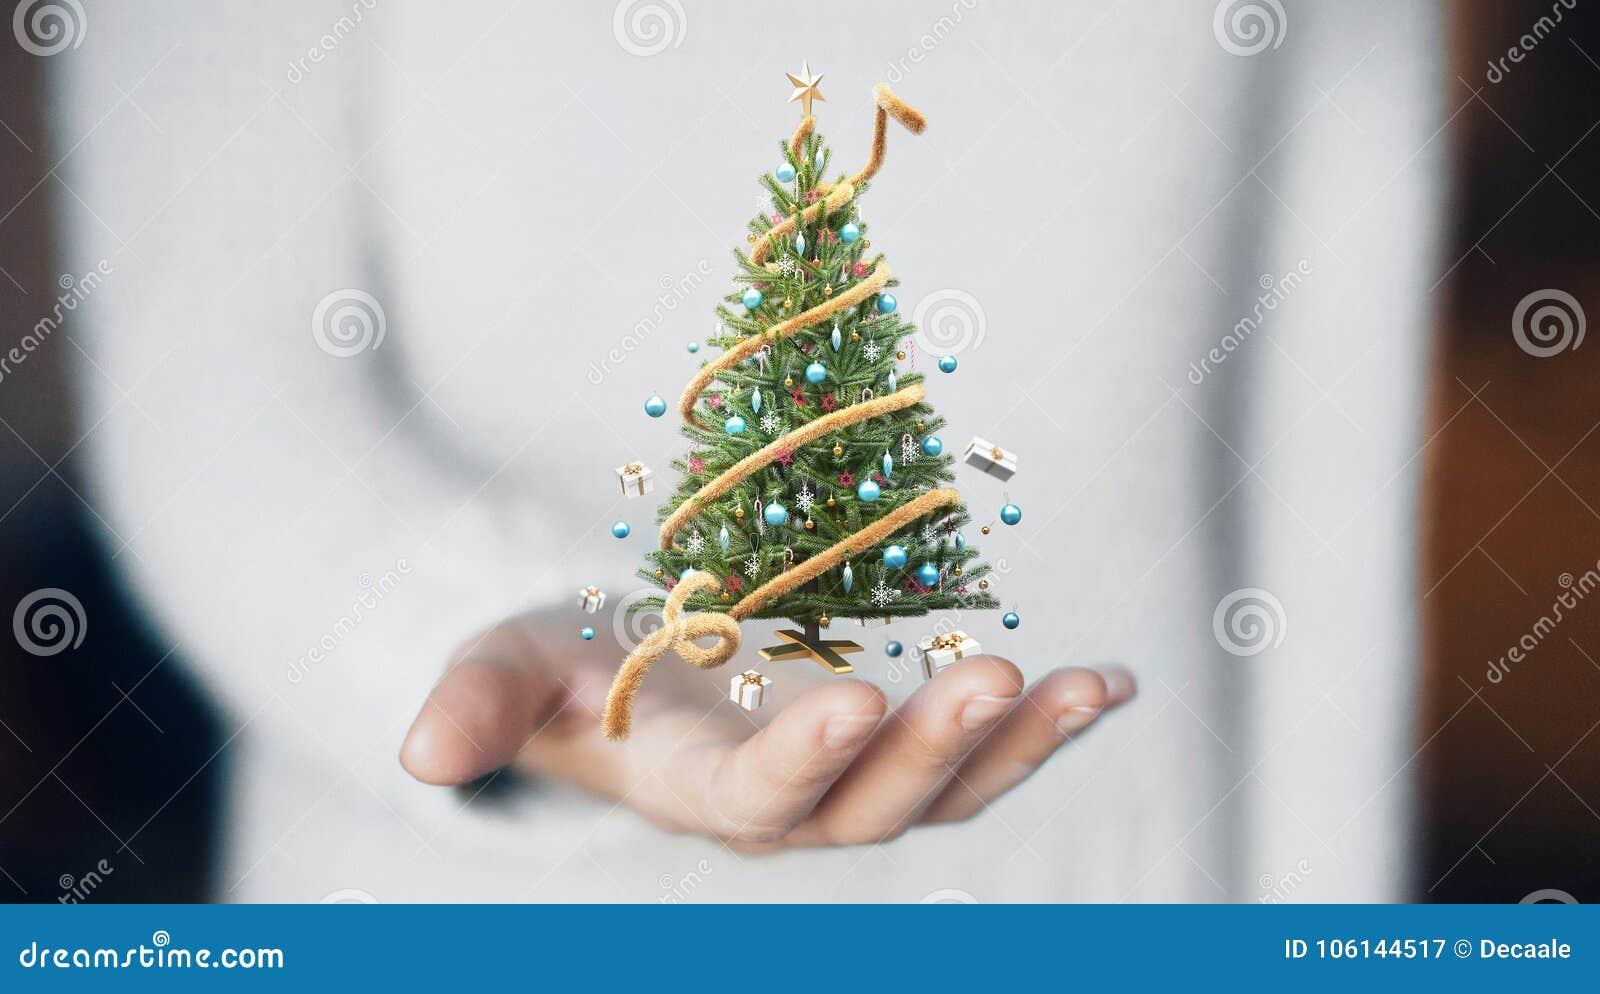 Christmas Tree On Hand Decorations Gift Card Stock Image Image